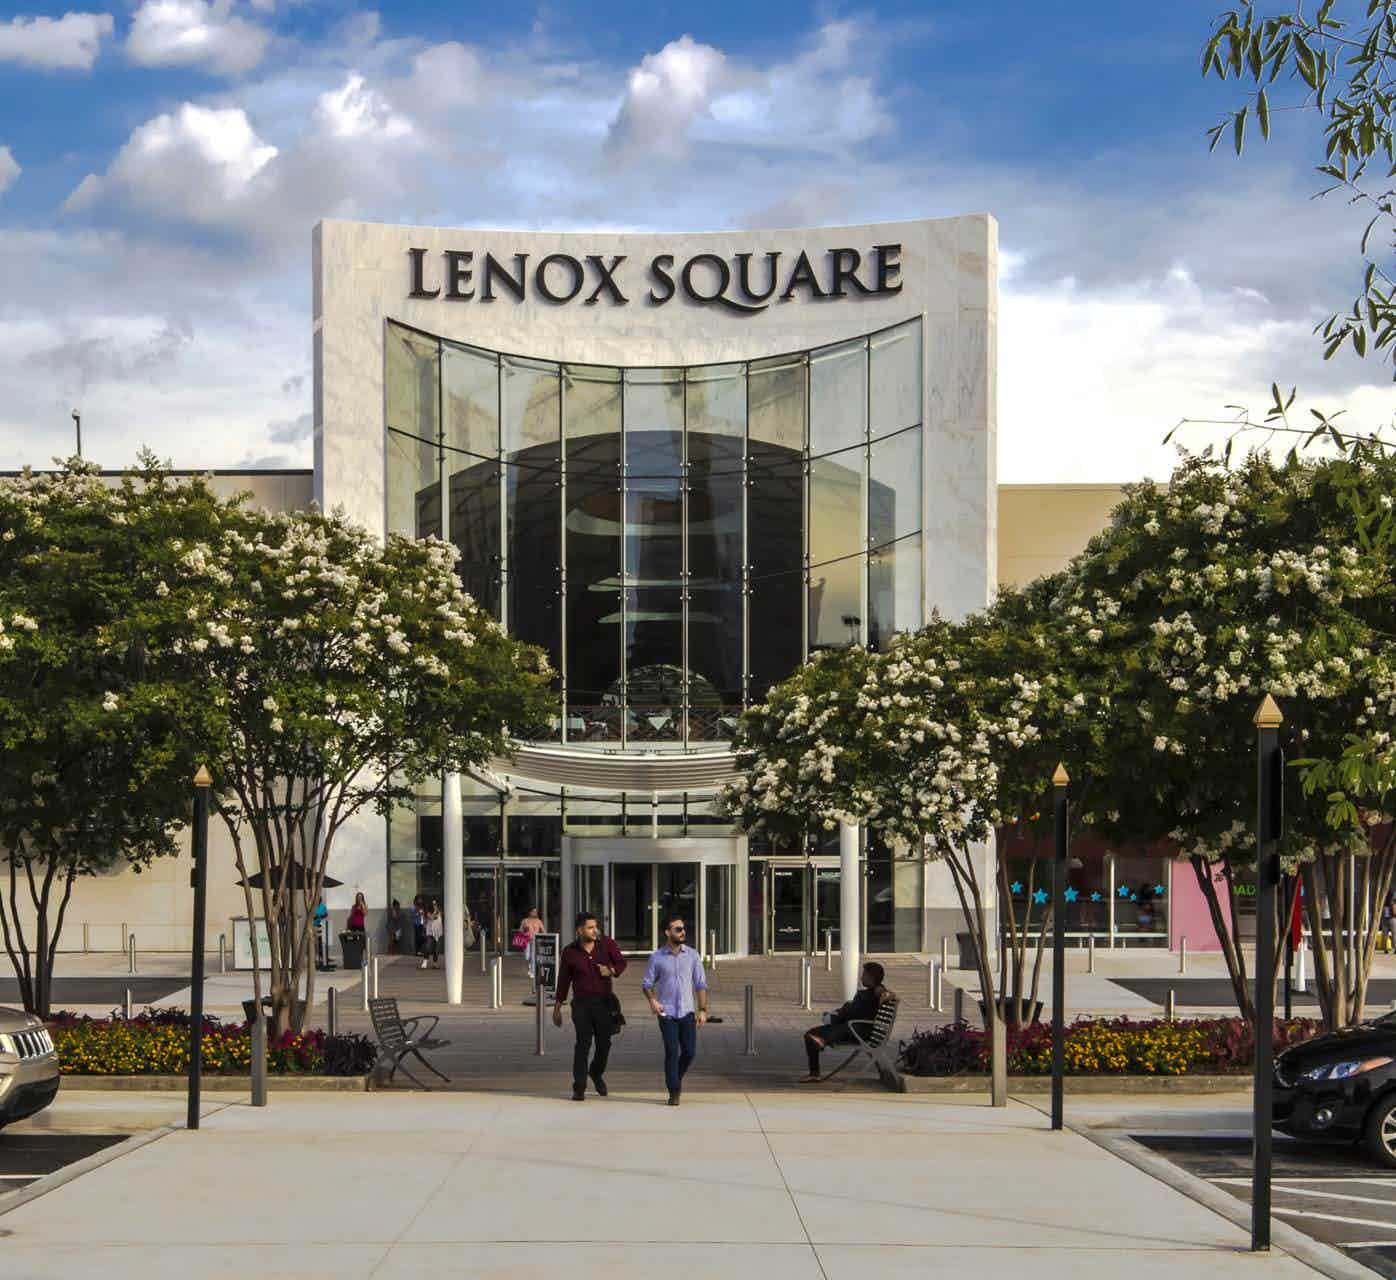 exterior of Lenox Square